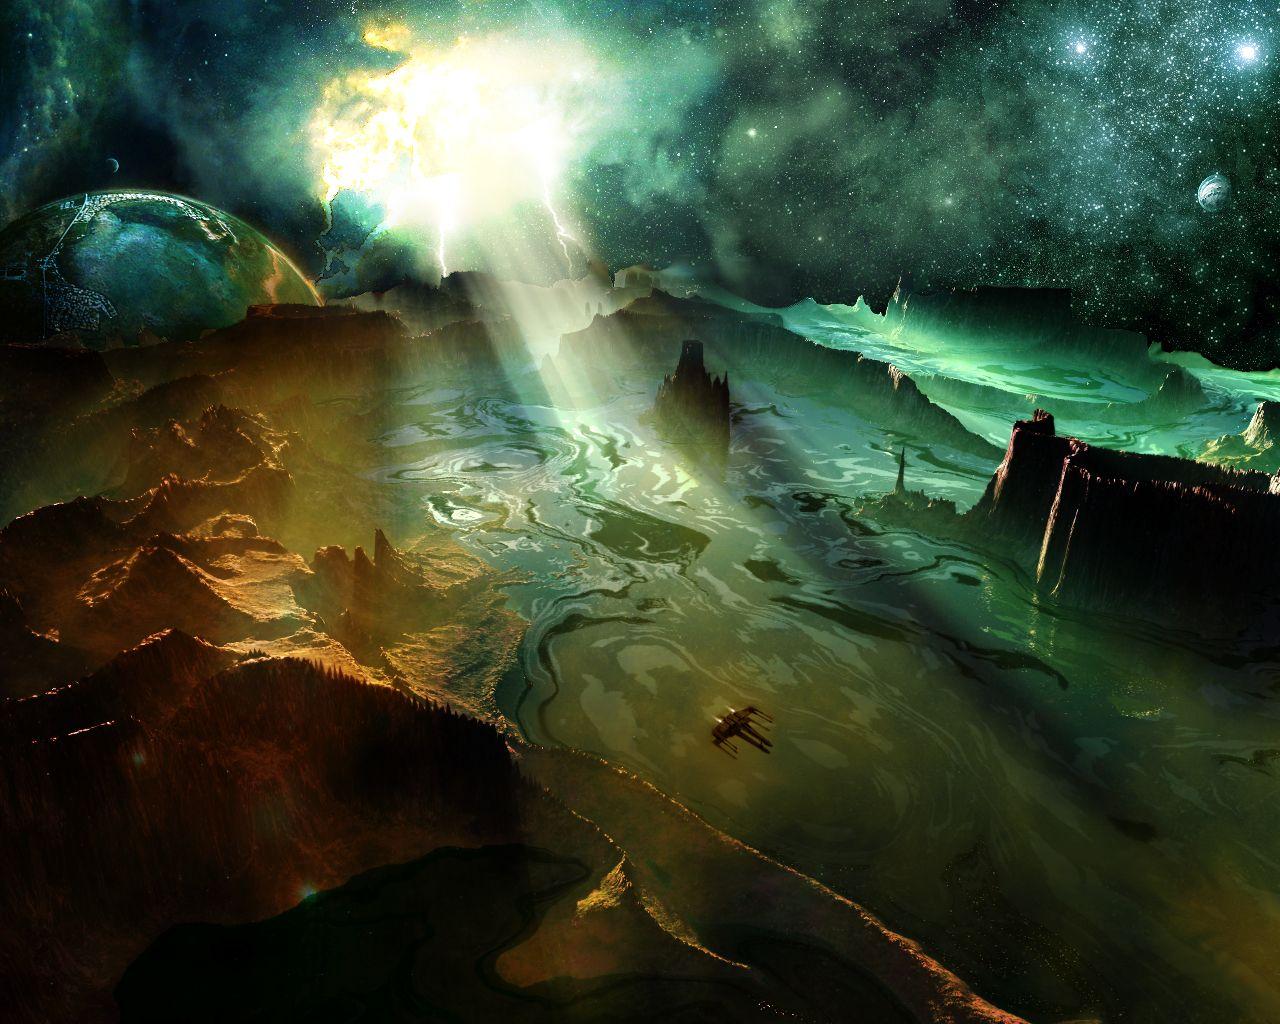 sci fi backgrounds - photo #28